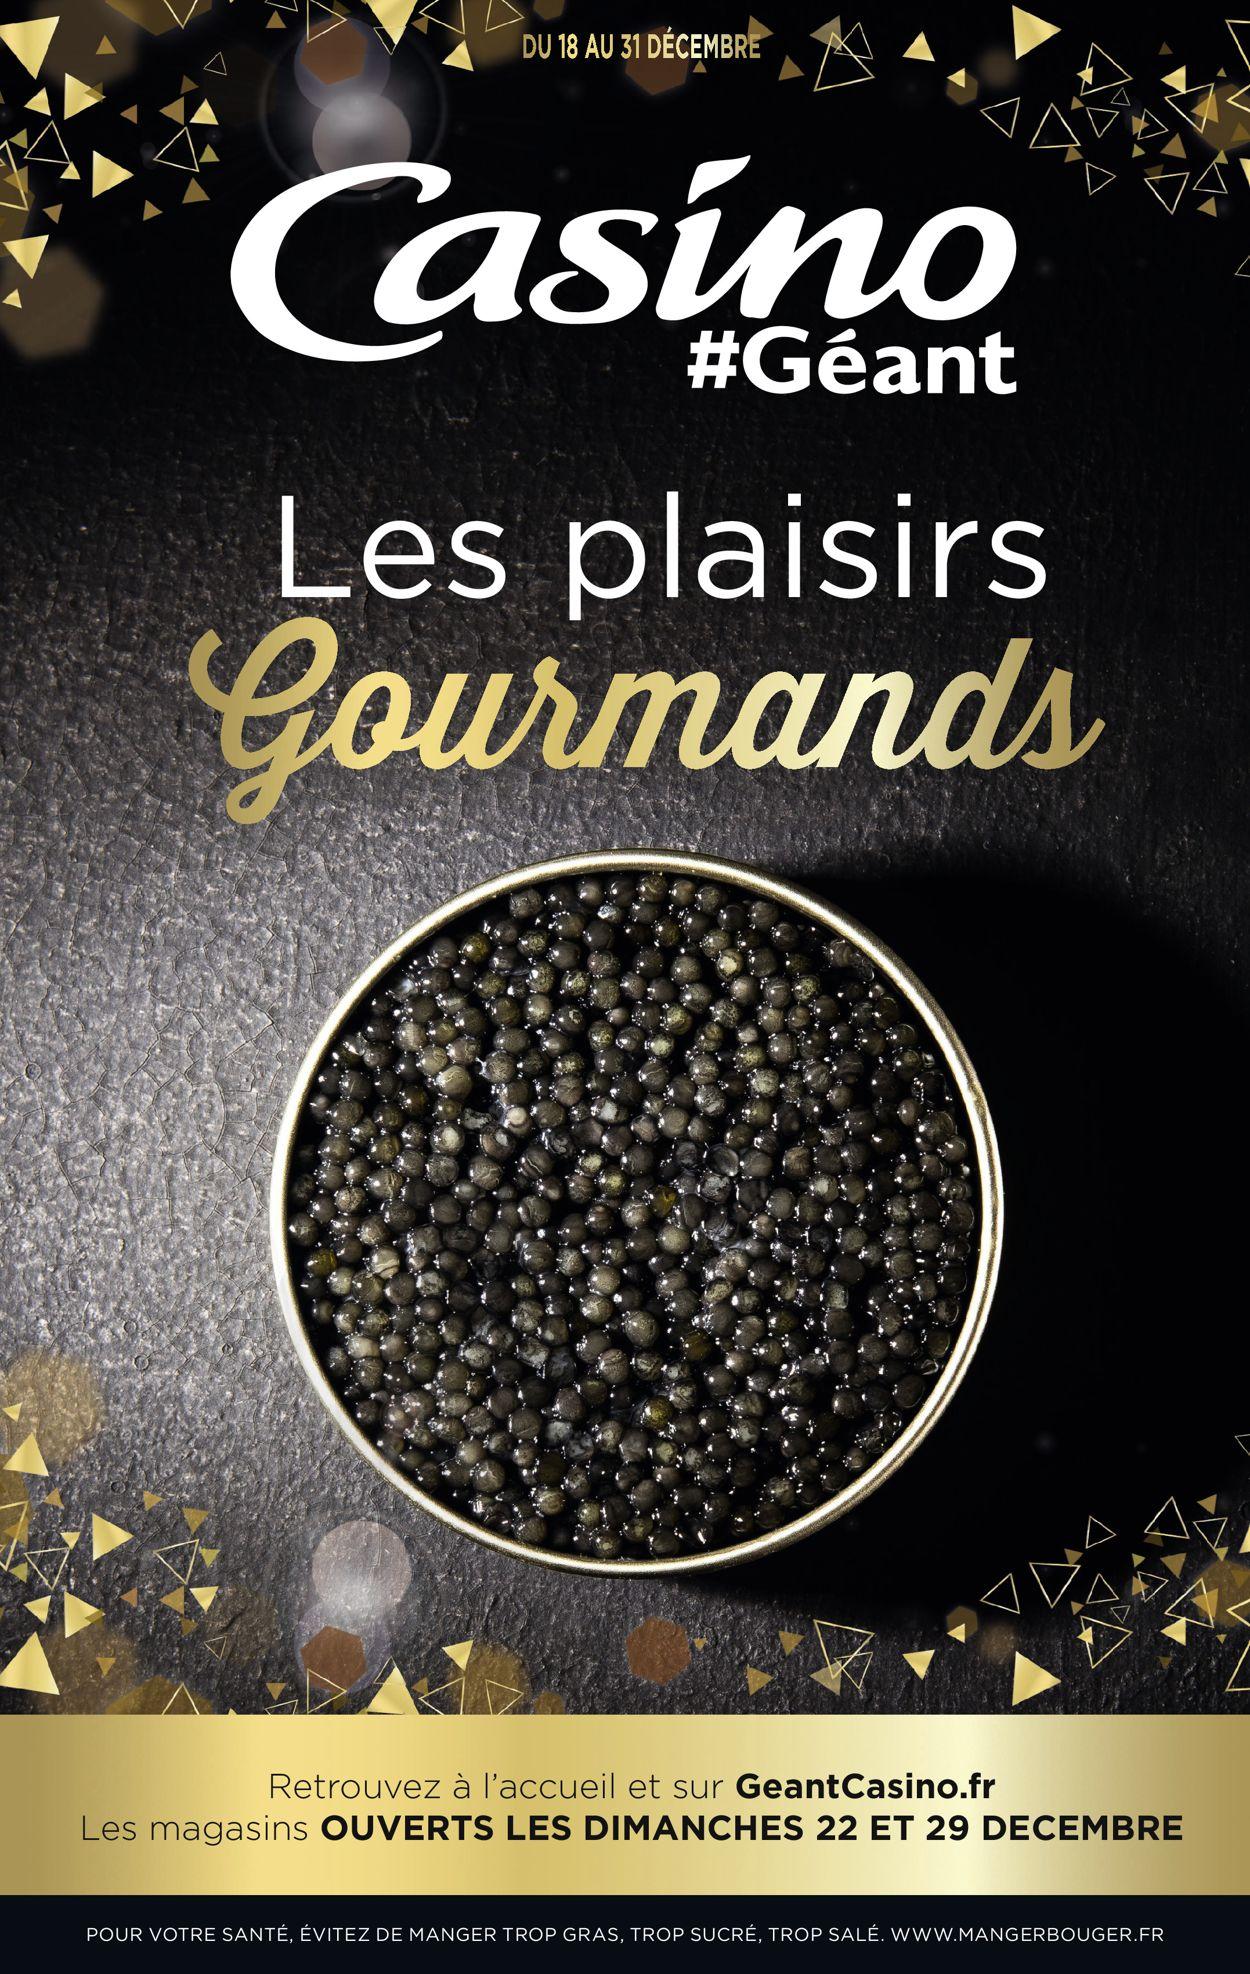 Géant Casino catalogue de Noël 2019 Catalogue - 18.12-31.12.2019